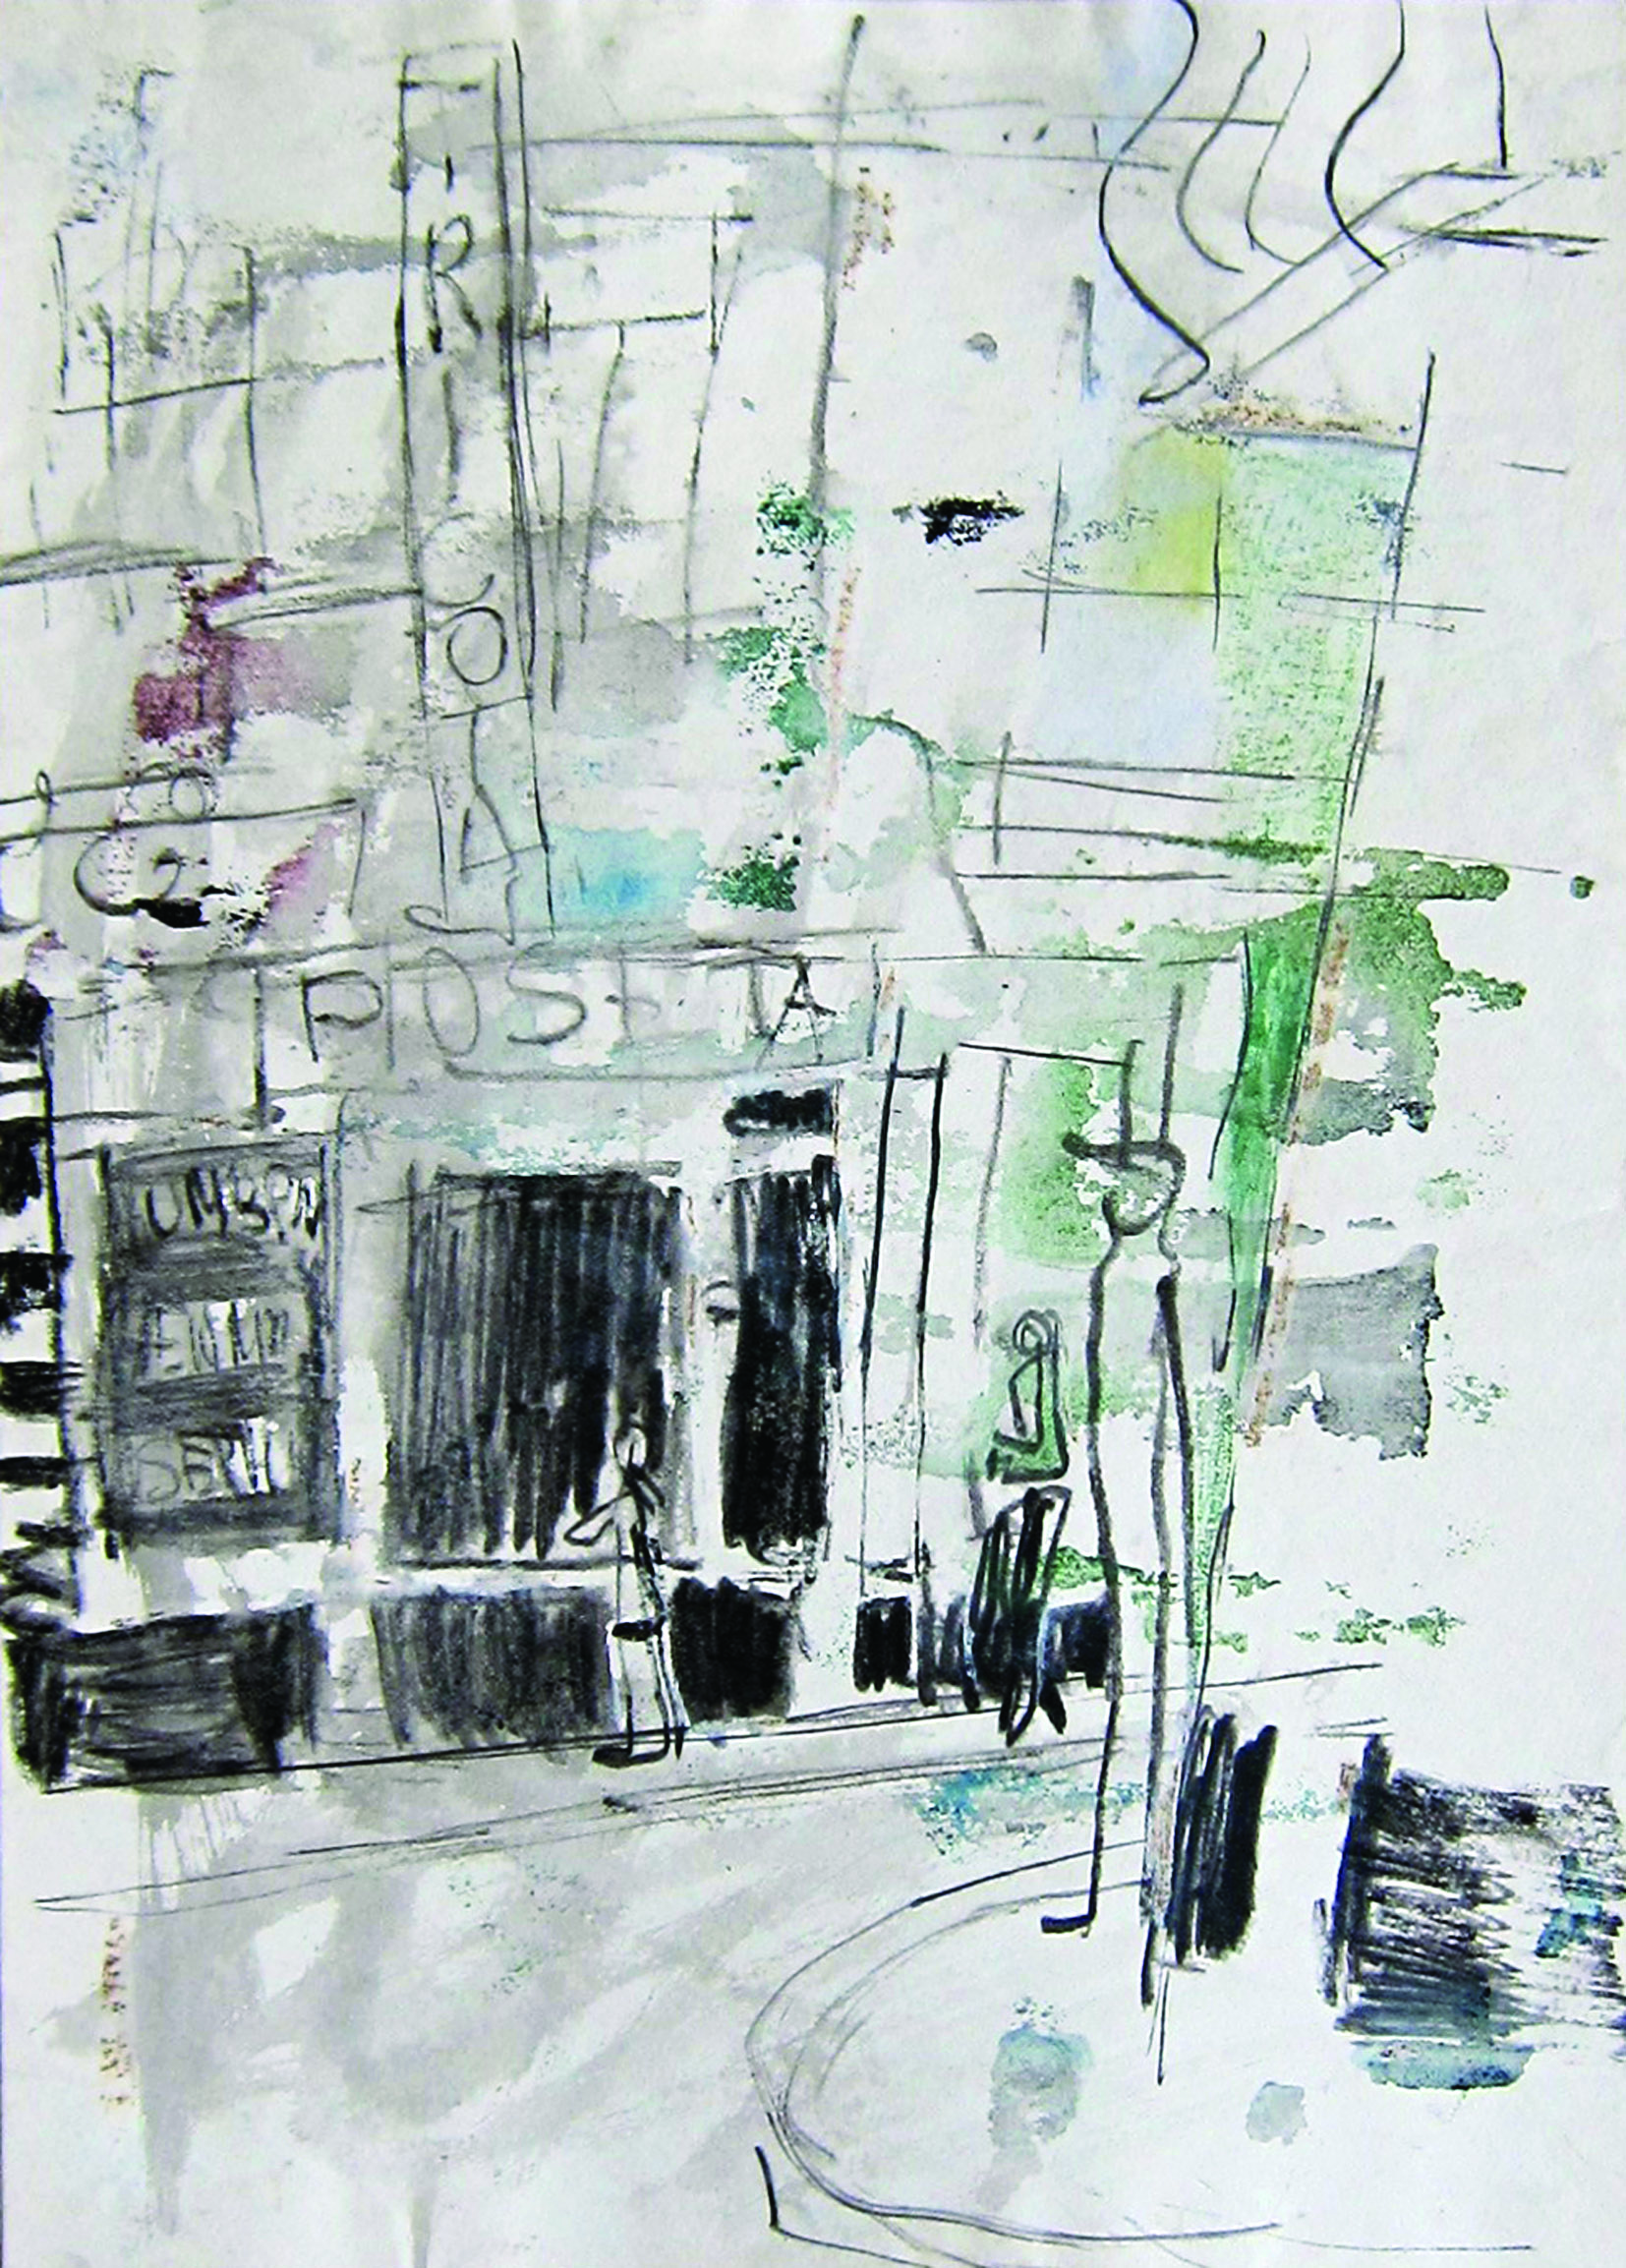 Poseta shop, 1980, watercolor, 42X30 cm